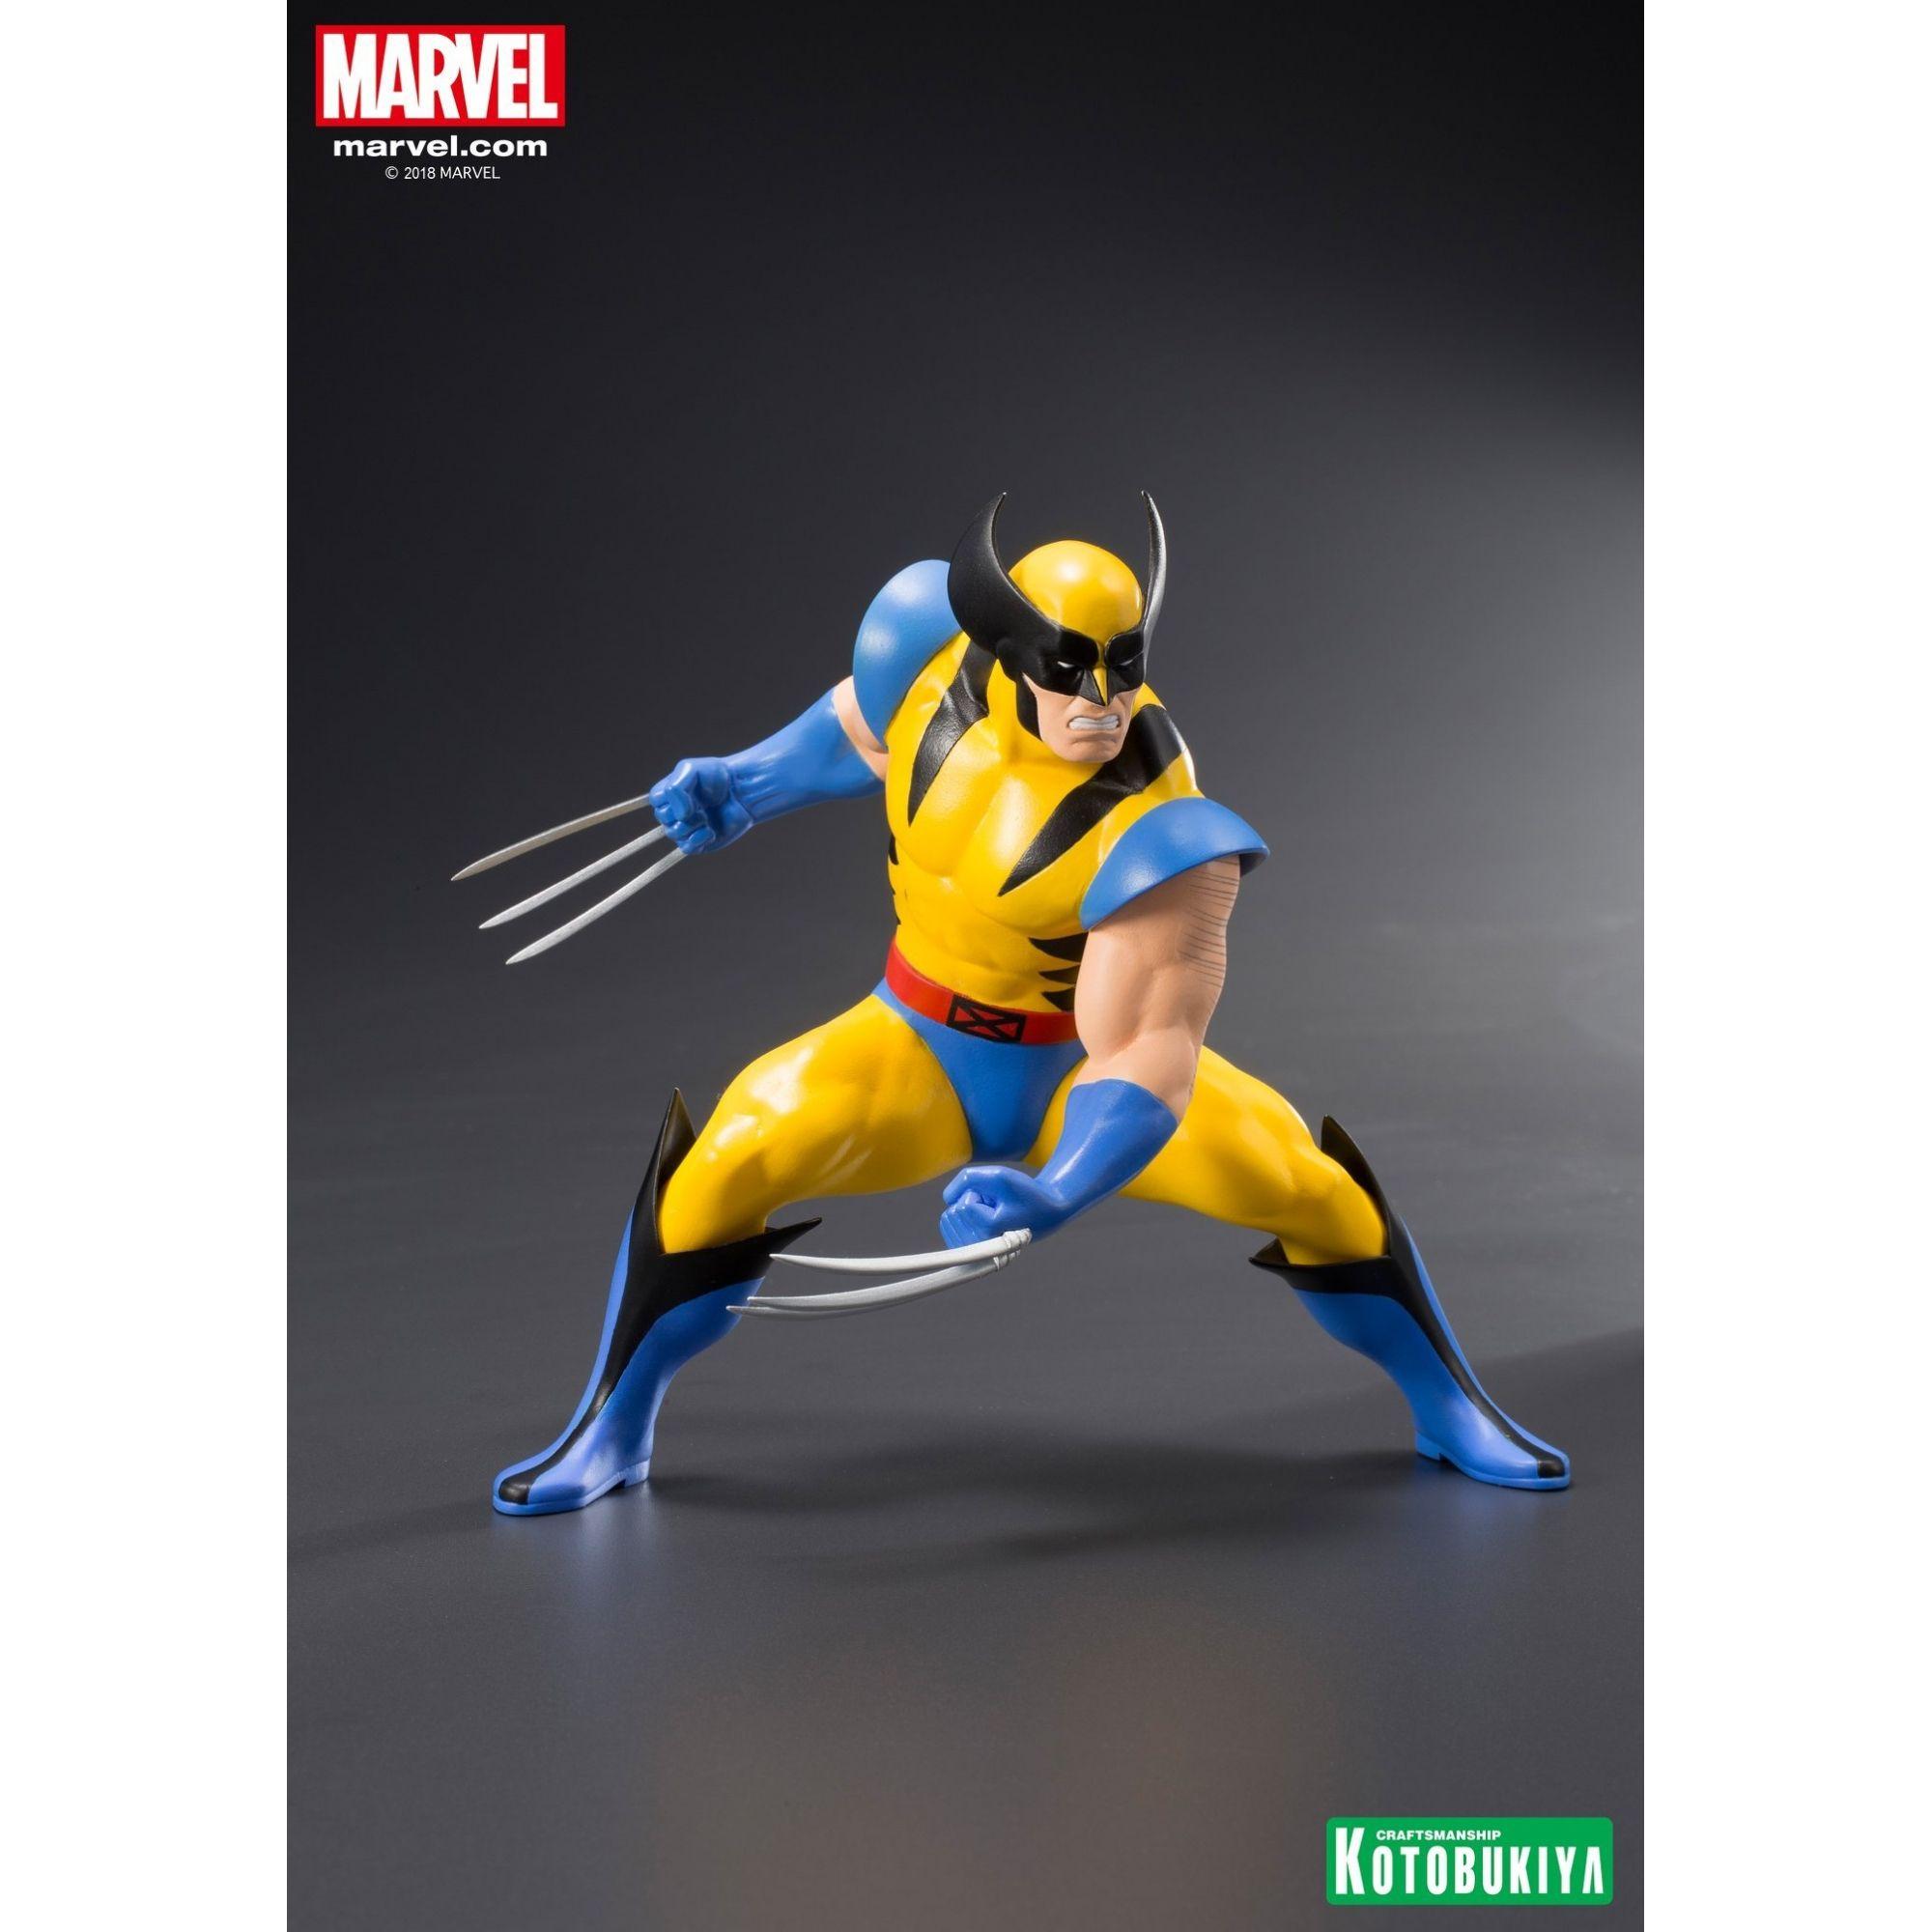 Estátua Wolverine & Jubilee: X-men 92 - Marvel (ArtFX) Escala1/10) (2-Pack) - Kotobukiya